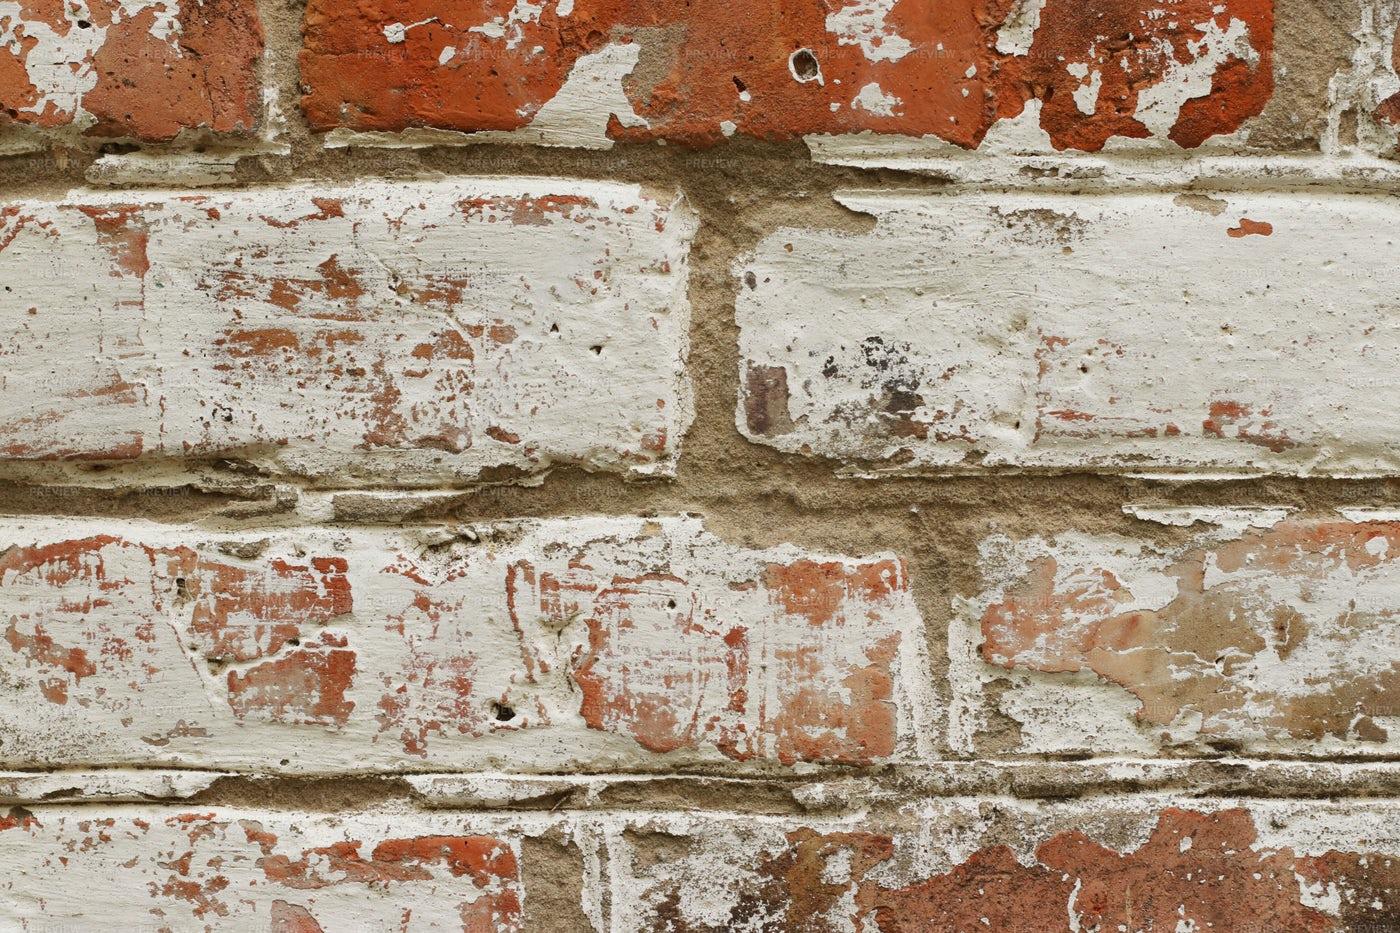 Old Painted Brick Wall: Stock Photos